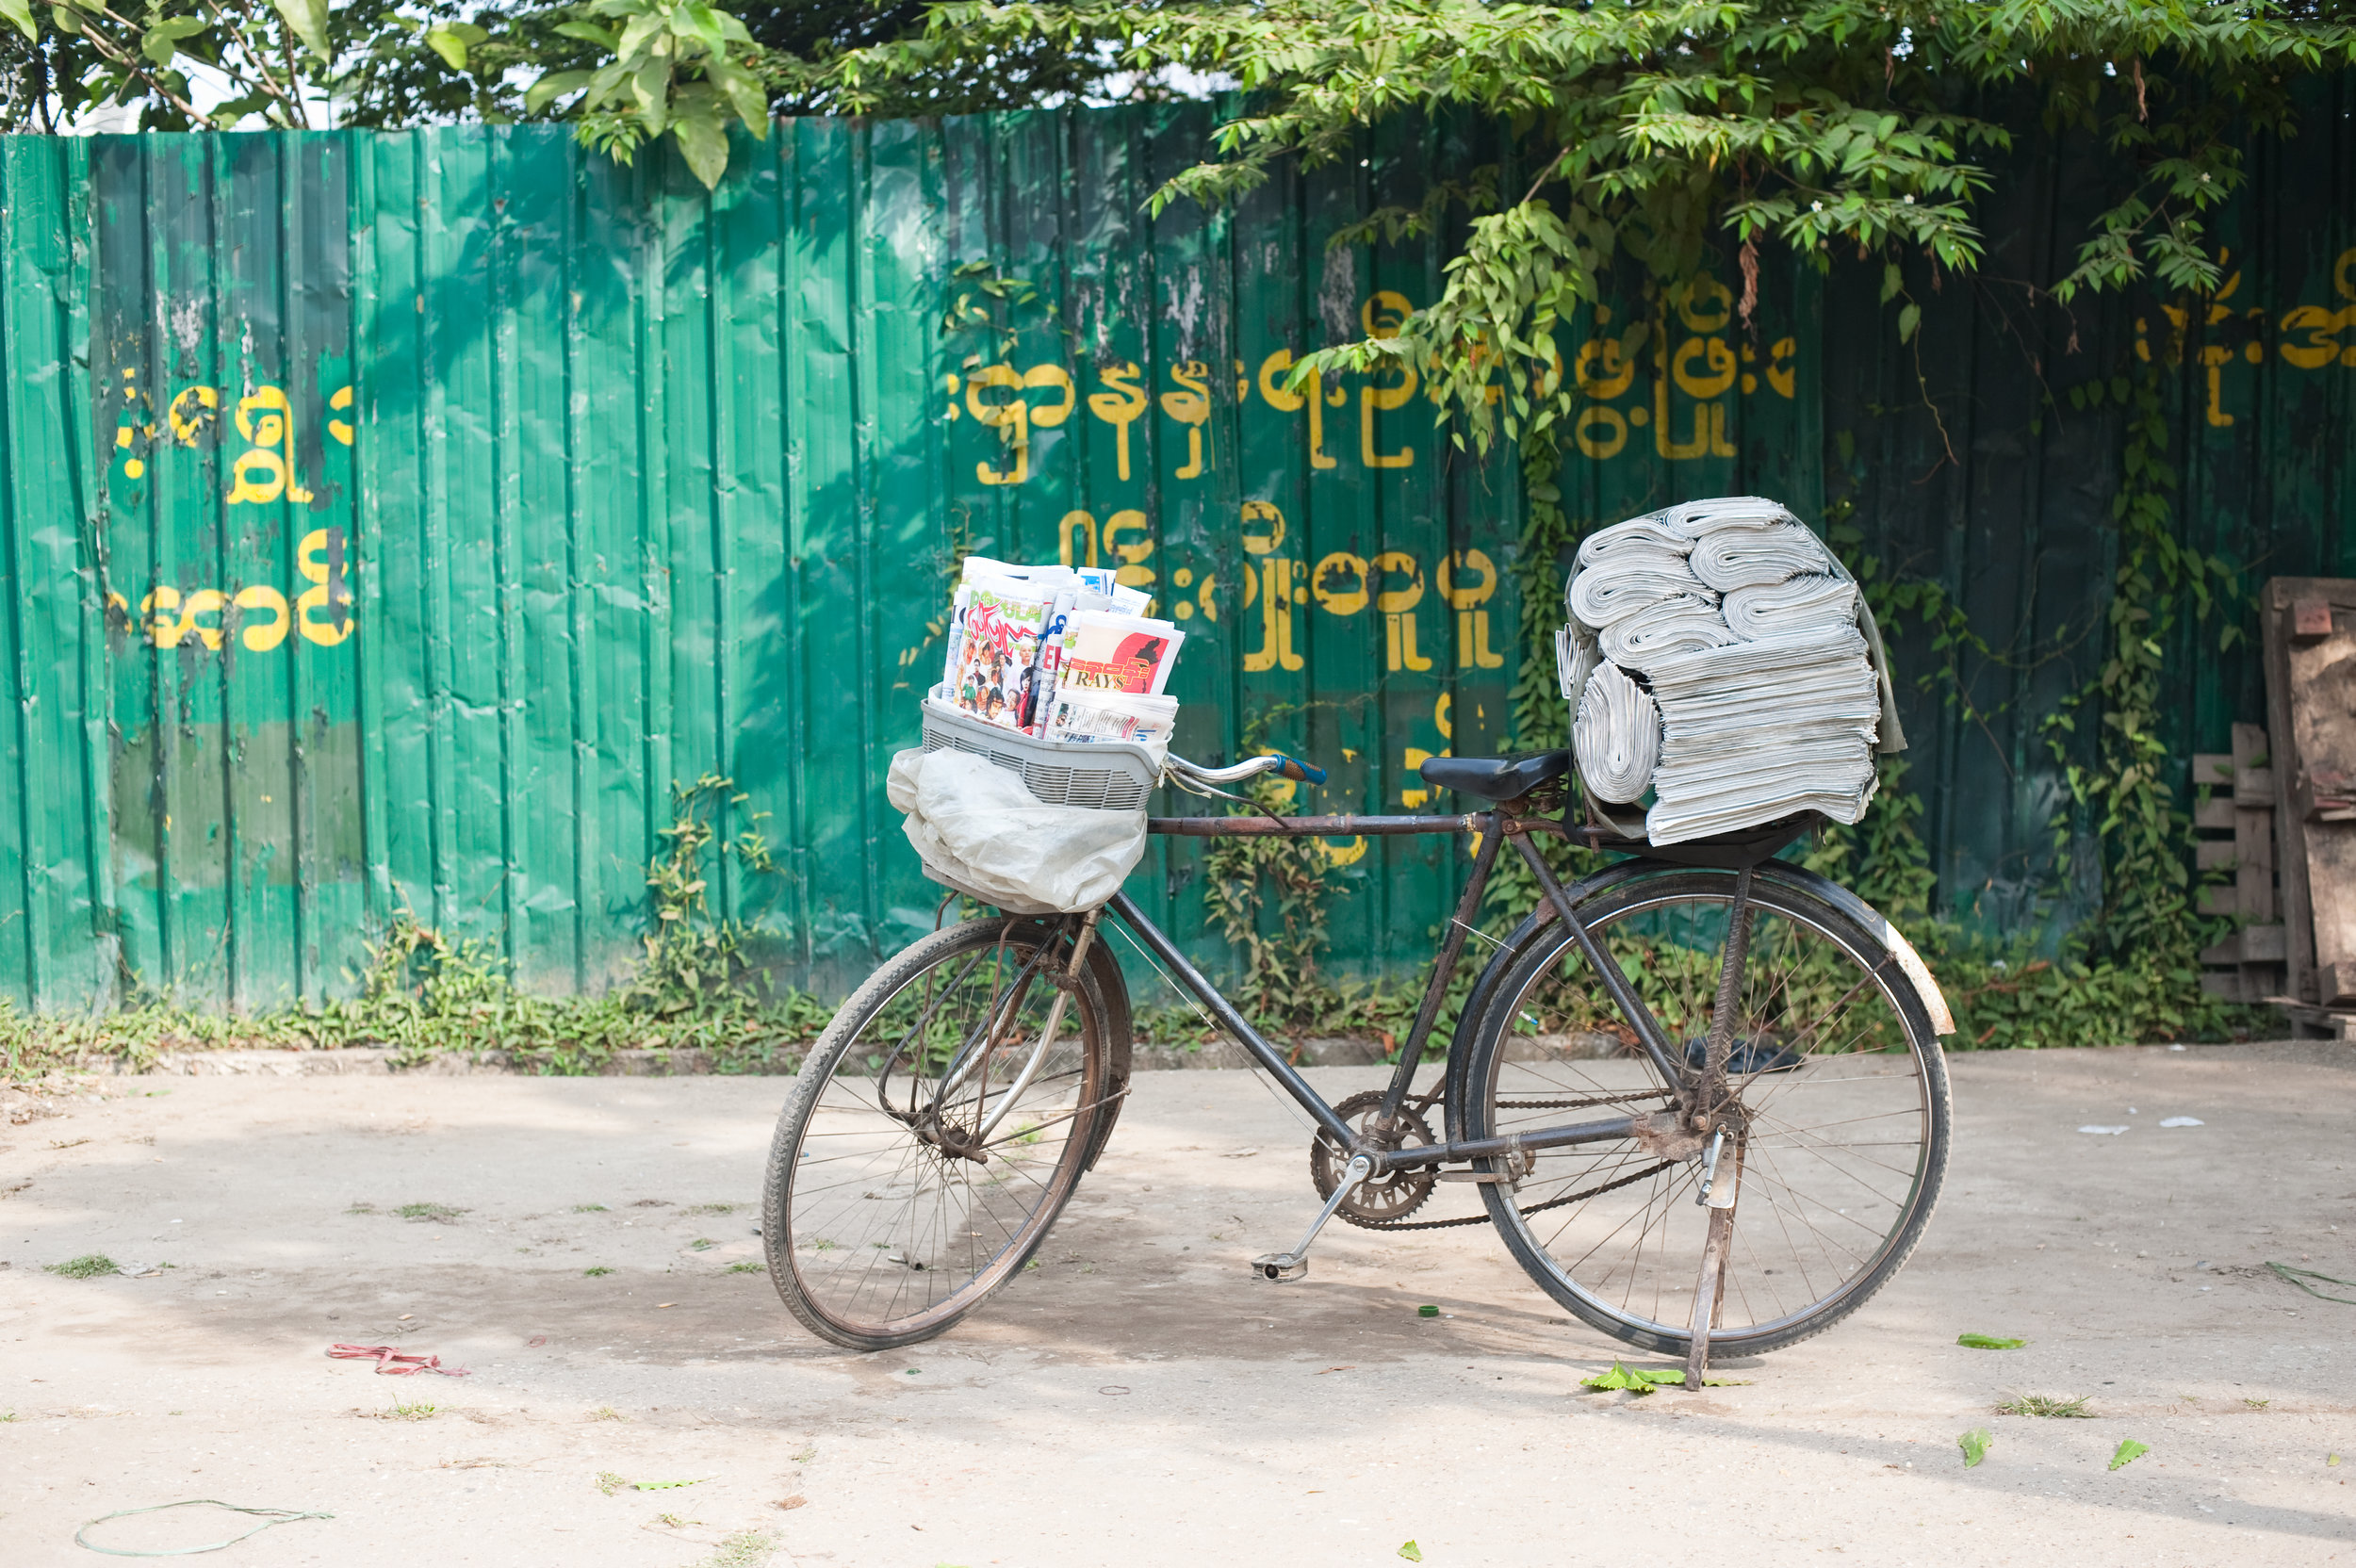 Photo by Kim Nguyen